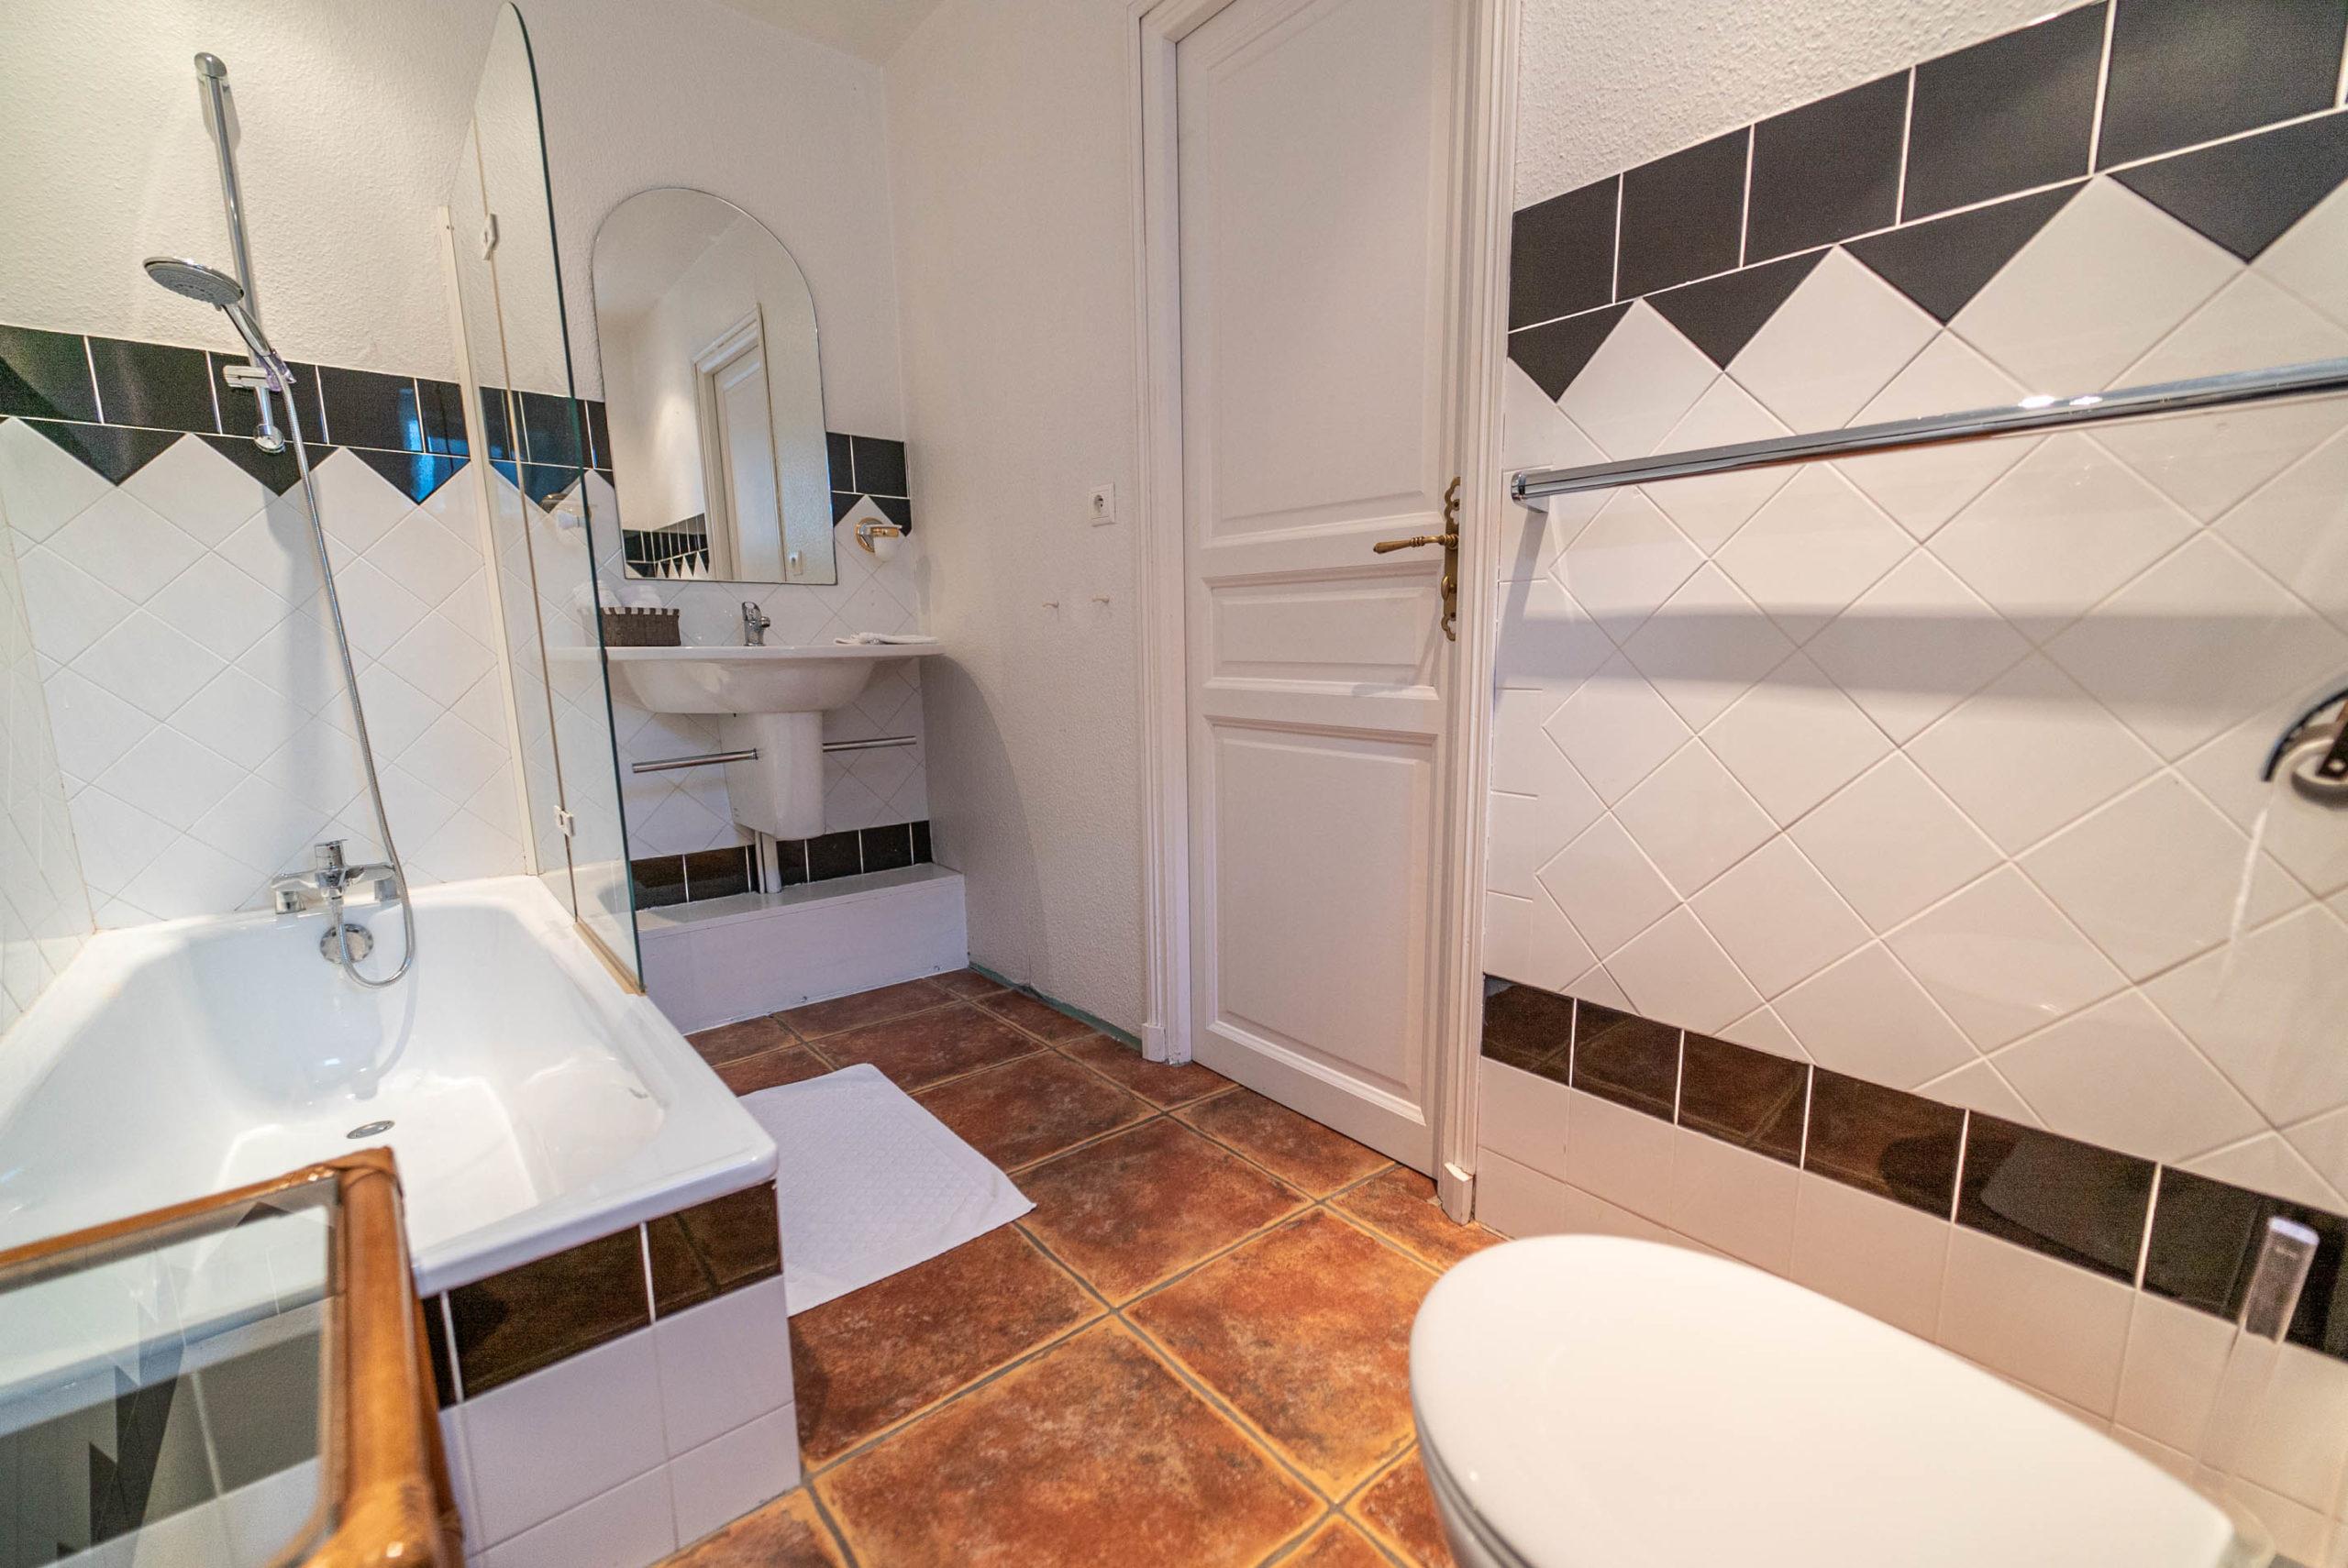 Salle de bain Chambre des convives chateau Rauly location bergerac Monbazillac